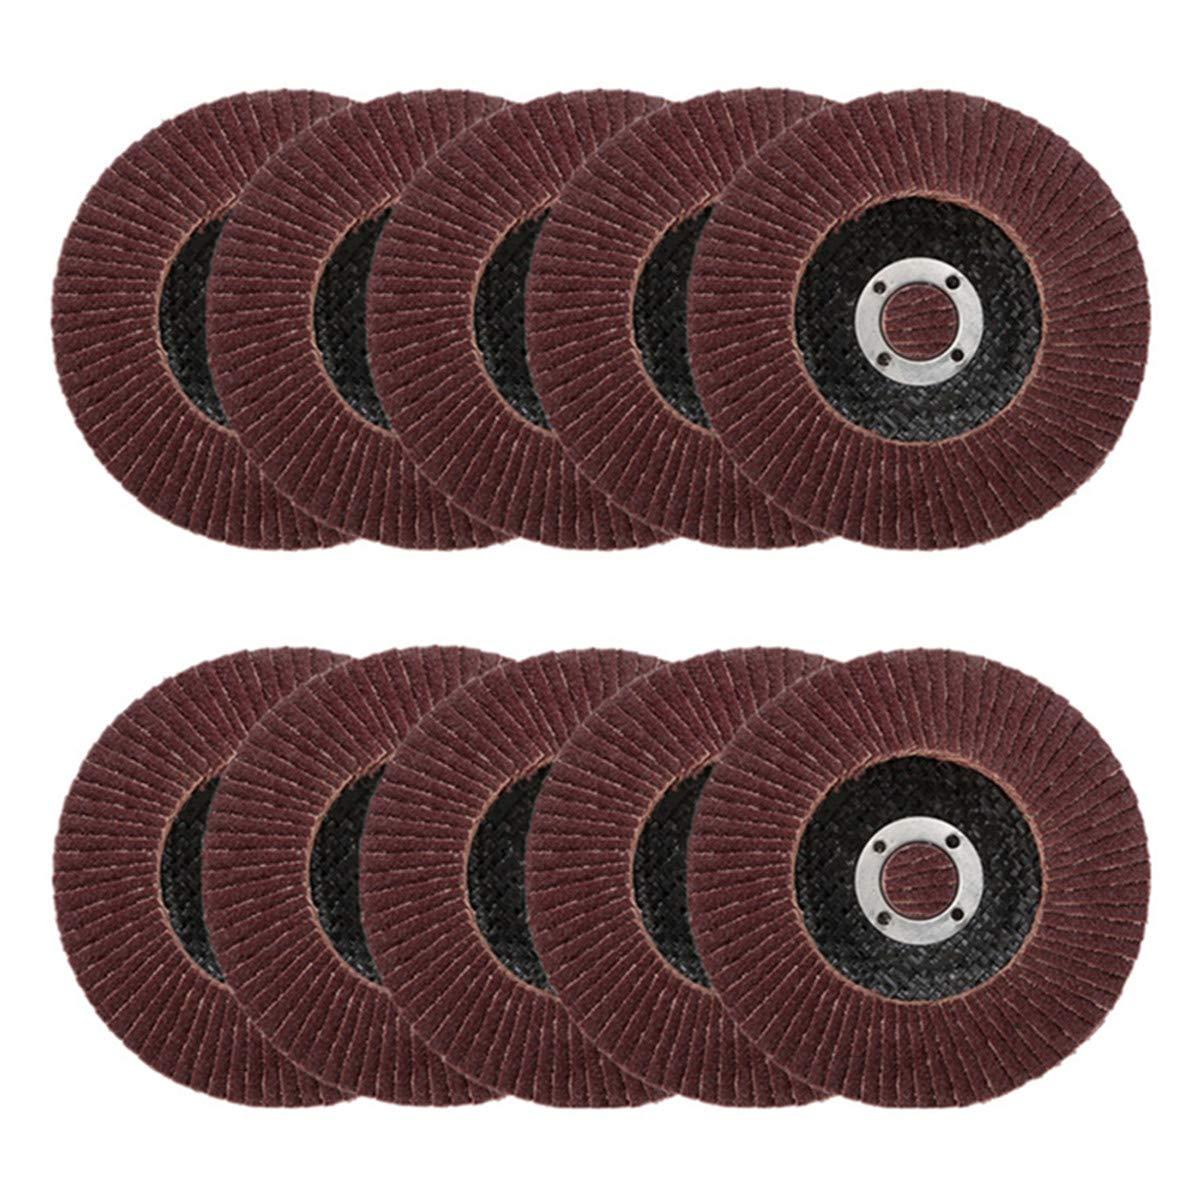 Nisorpa 115MM/4.5'' Flap Sanding Discs 25pcs Pack Flap Disc 40 Grit Bulk Industrial Premium Aluminium Oxide Abrasive Stainless Steel Grinding Wheels for Metal Wood Sanding Polishing